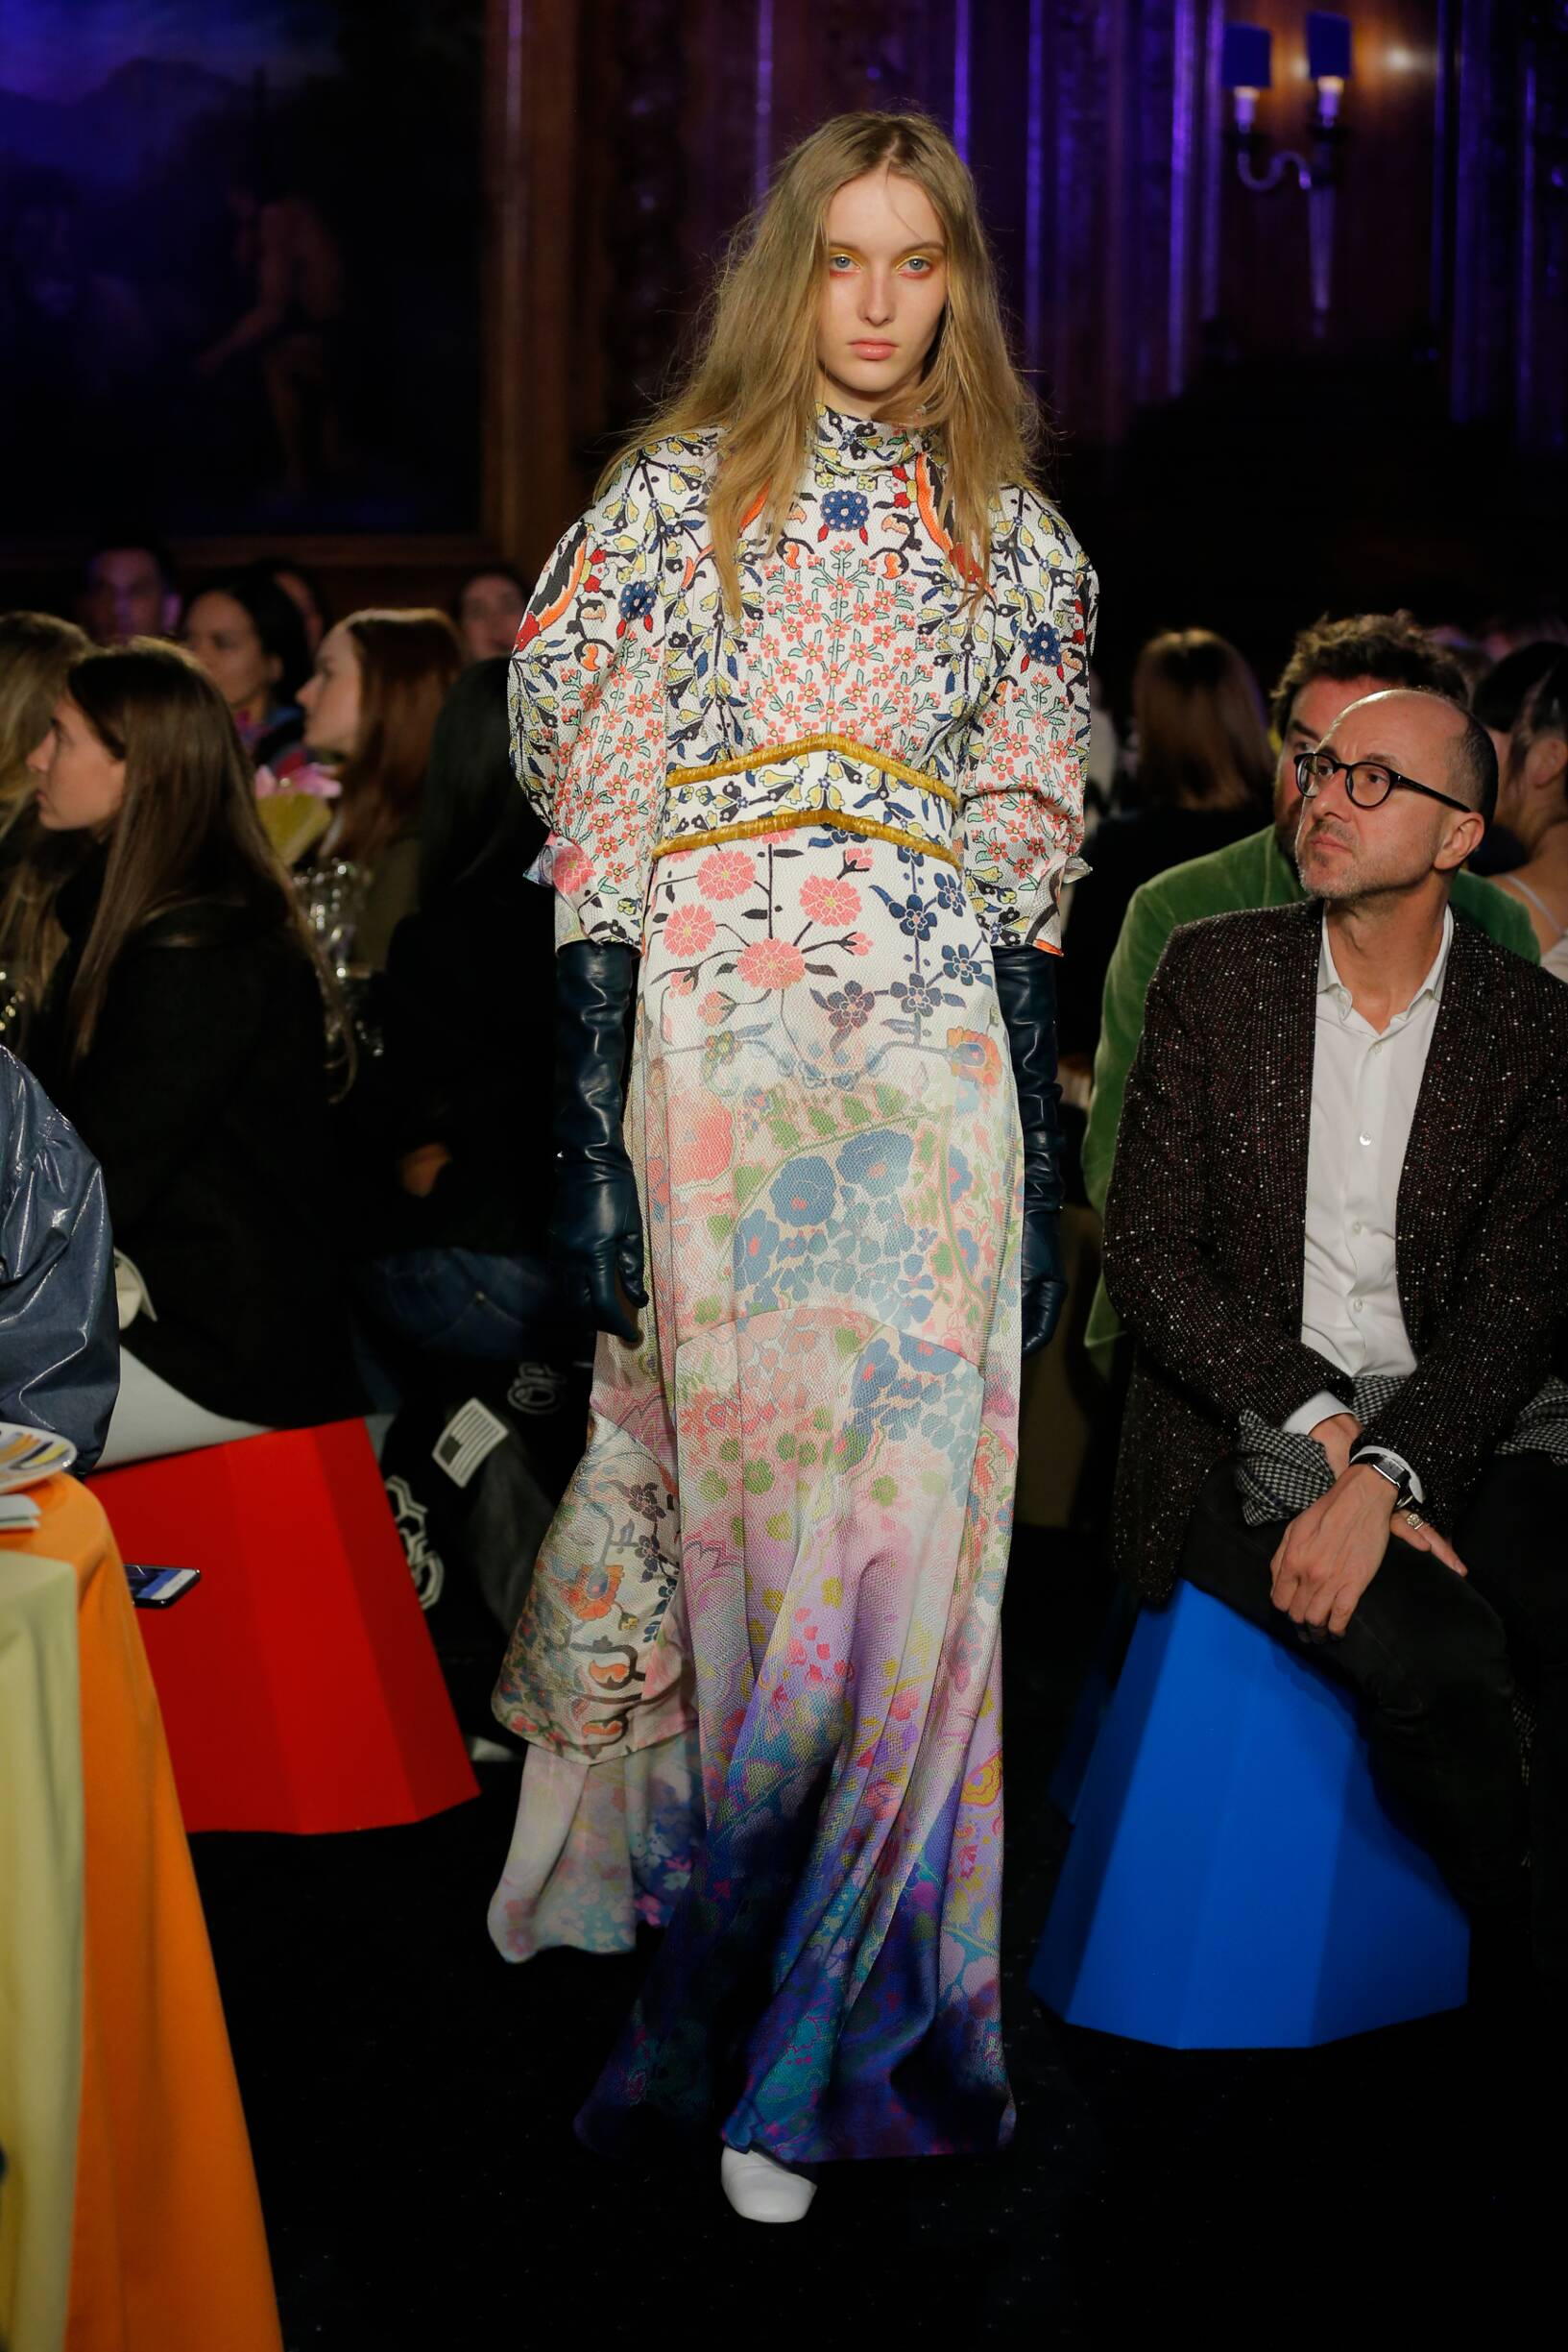 Runway Peter Pilotto Fall Winter 2018 Women's Collection London Fashion Week